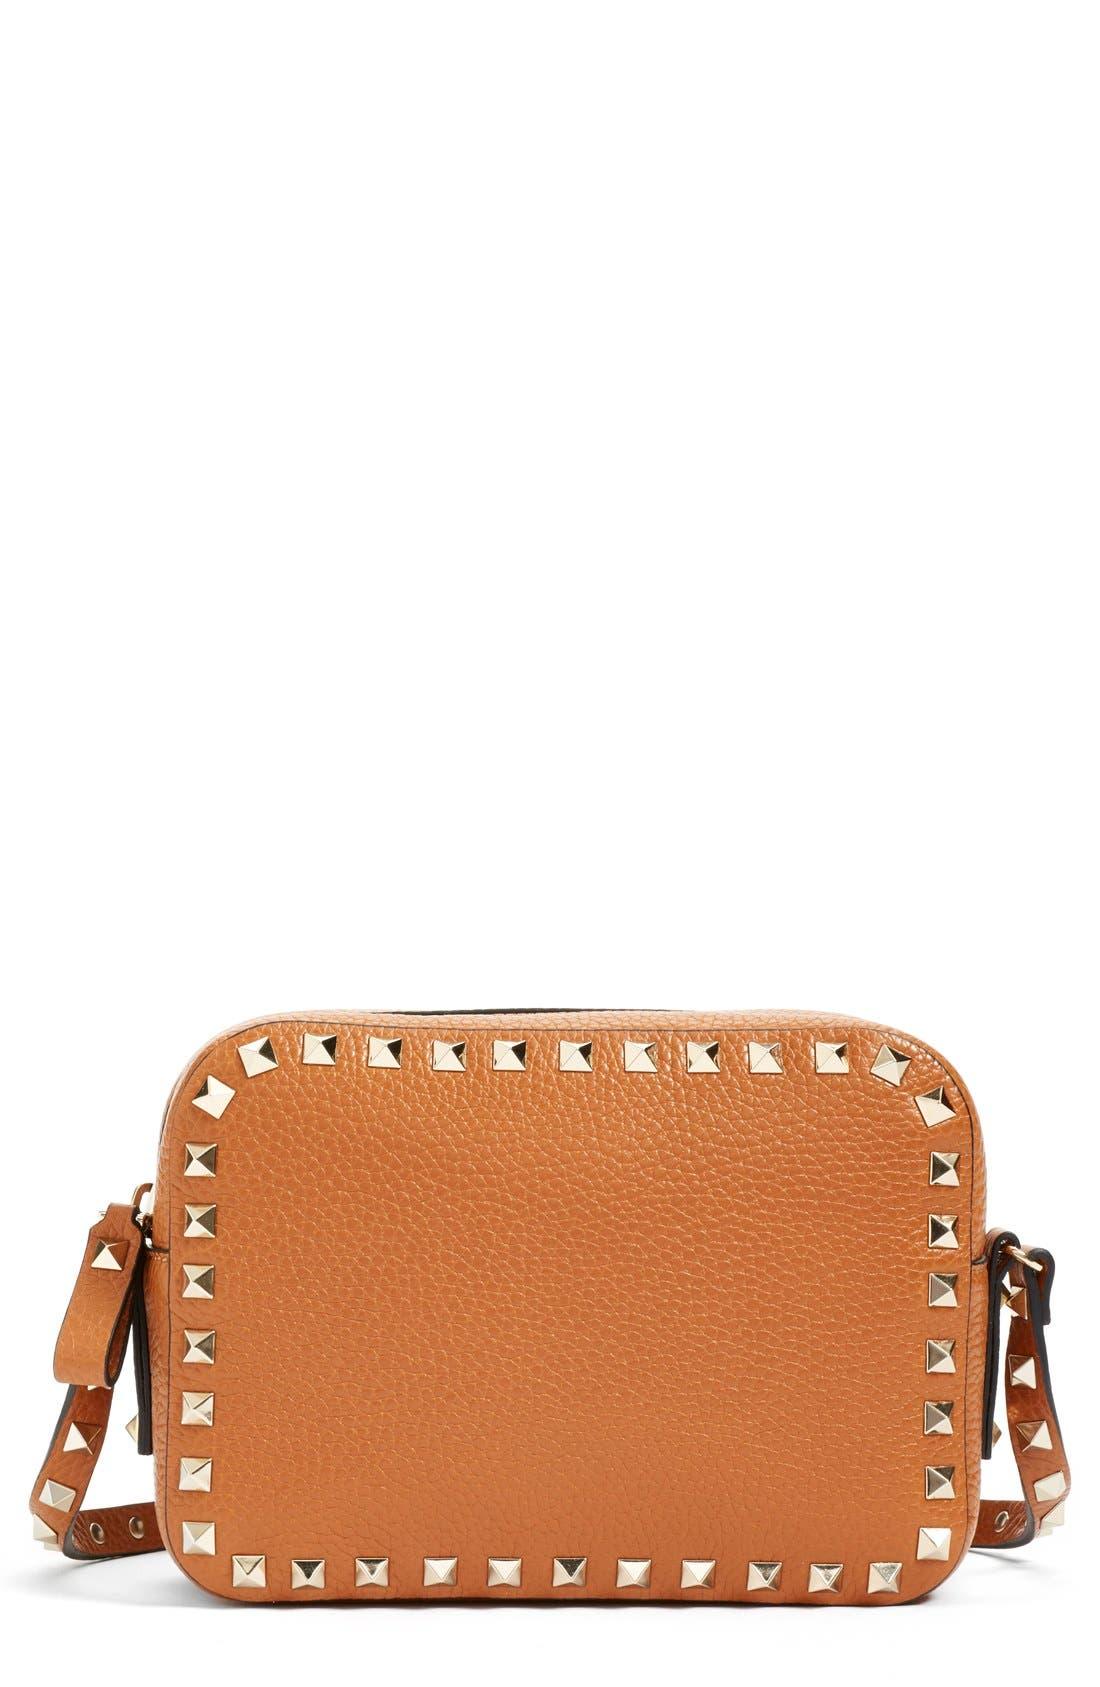 Alternate Image 1 Selected - Valentino 'Rockstud - Alce' Calfskin Leather Camera Crossbody Bag